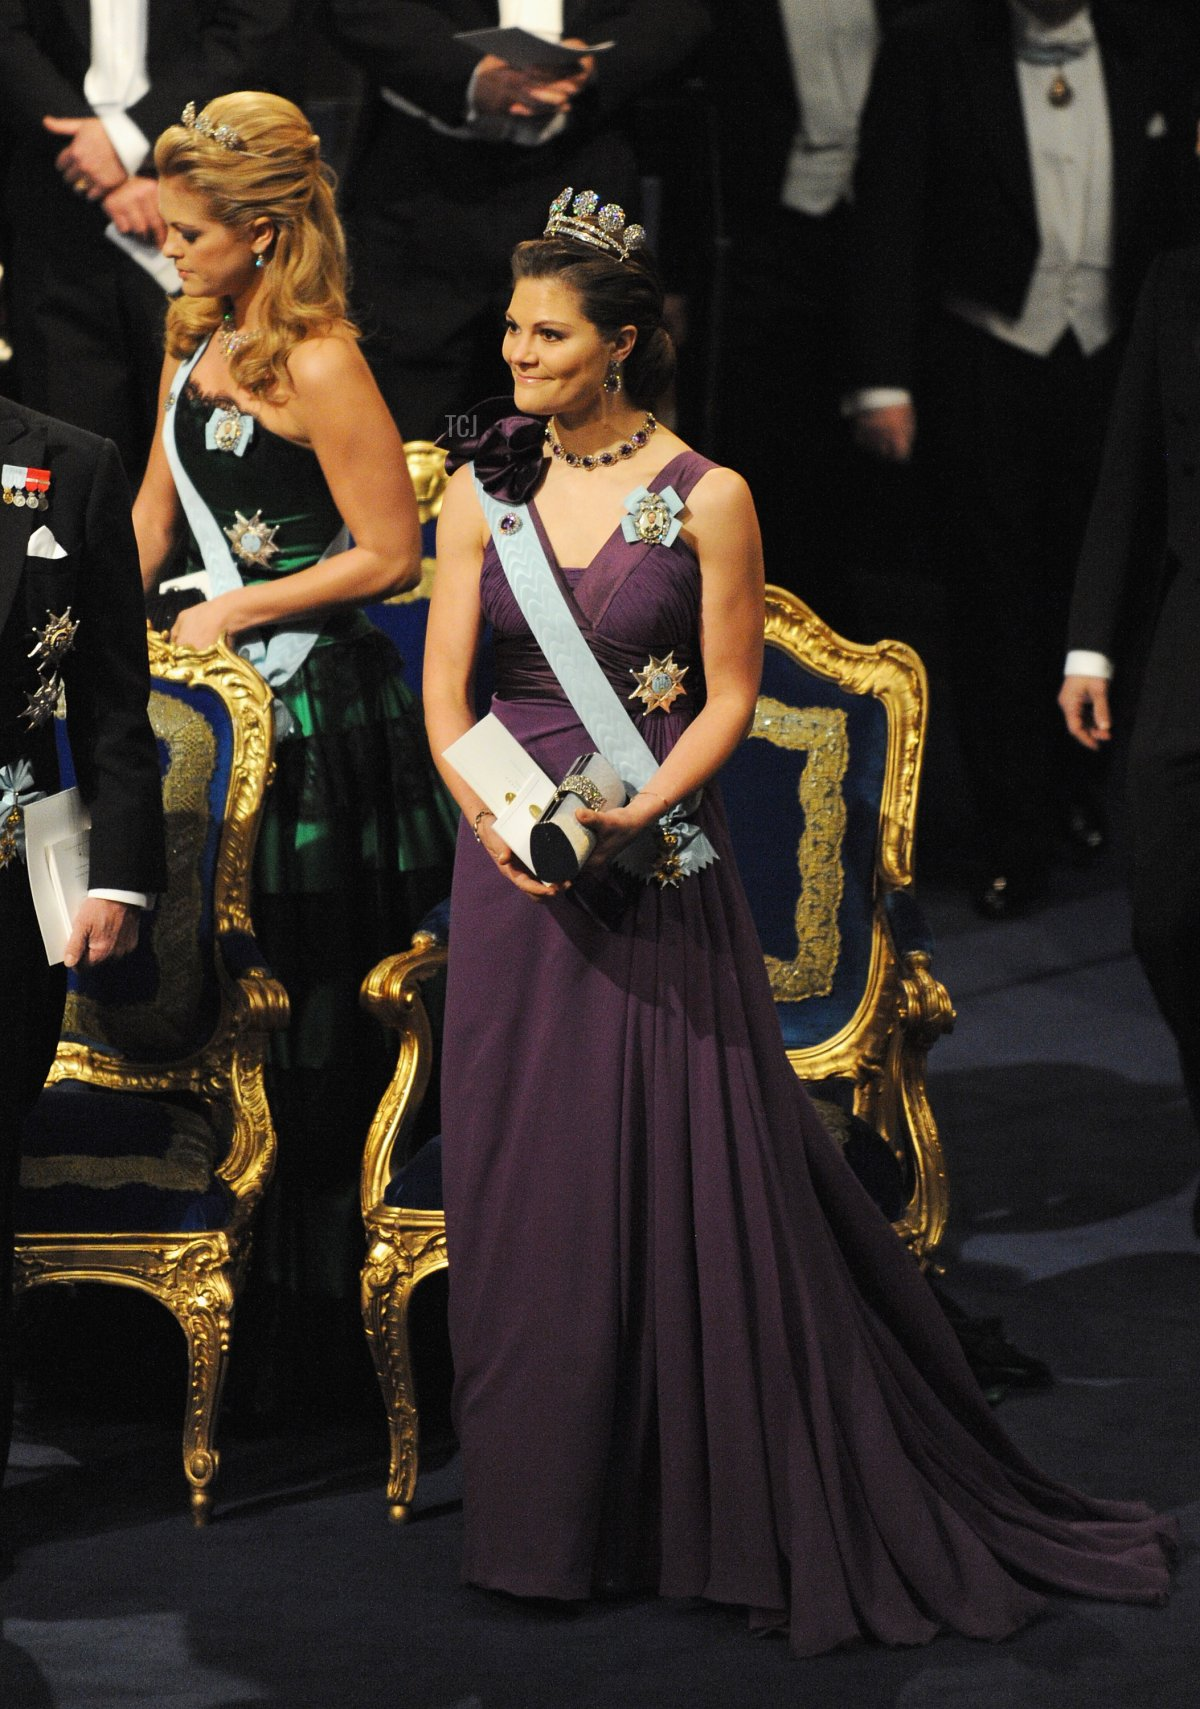 Crown Princess Victoria of Sweden attends the Nobel Foundation Prize Awards Ceremony and Banquet on December 10, 2009 in Stockholm, Sweden